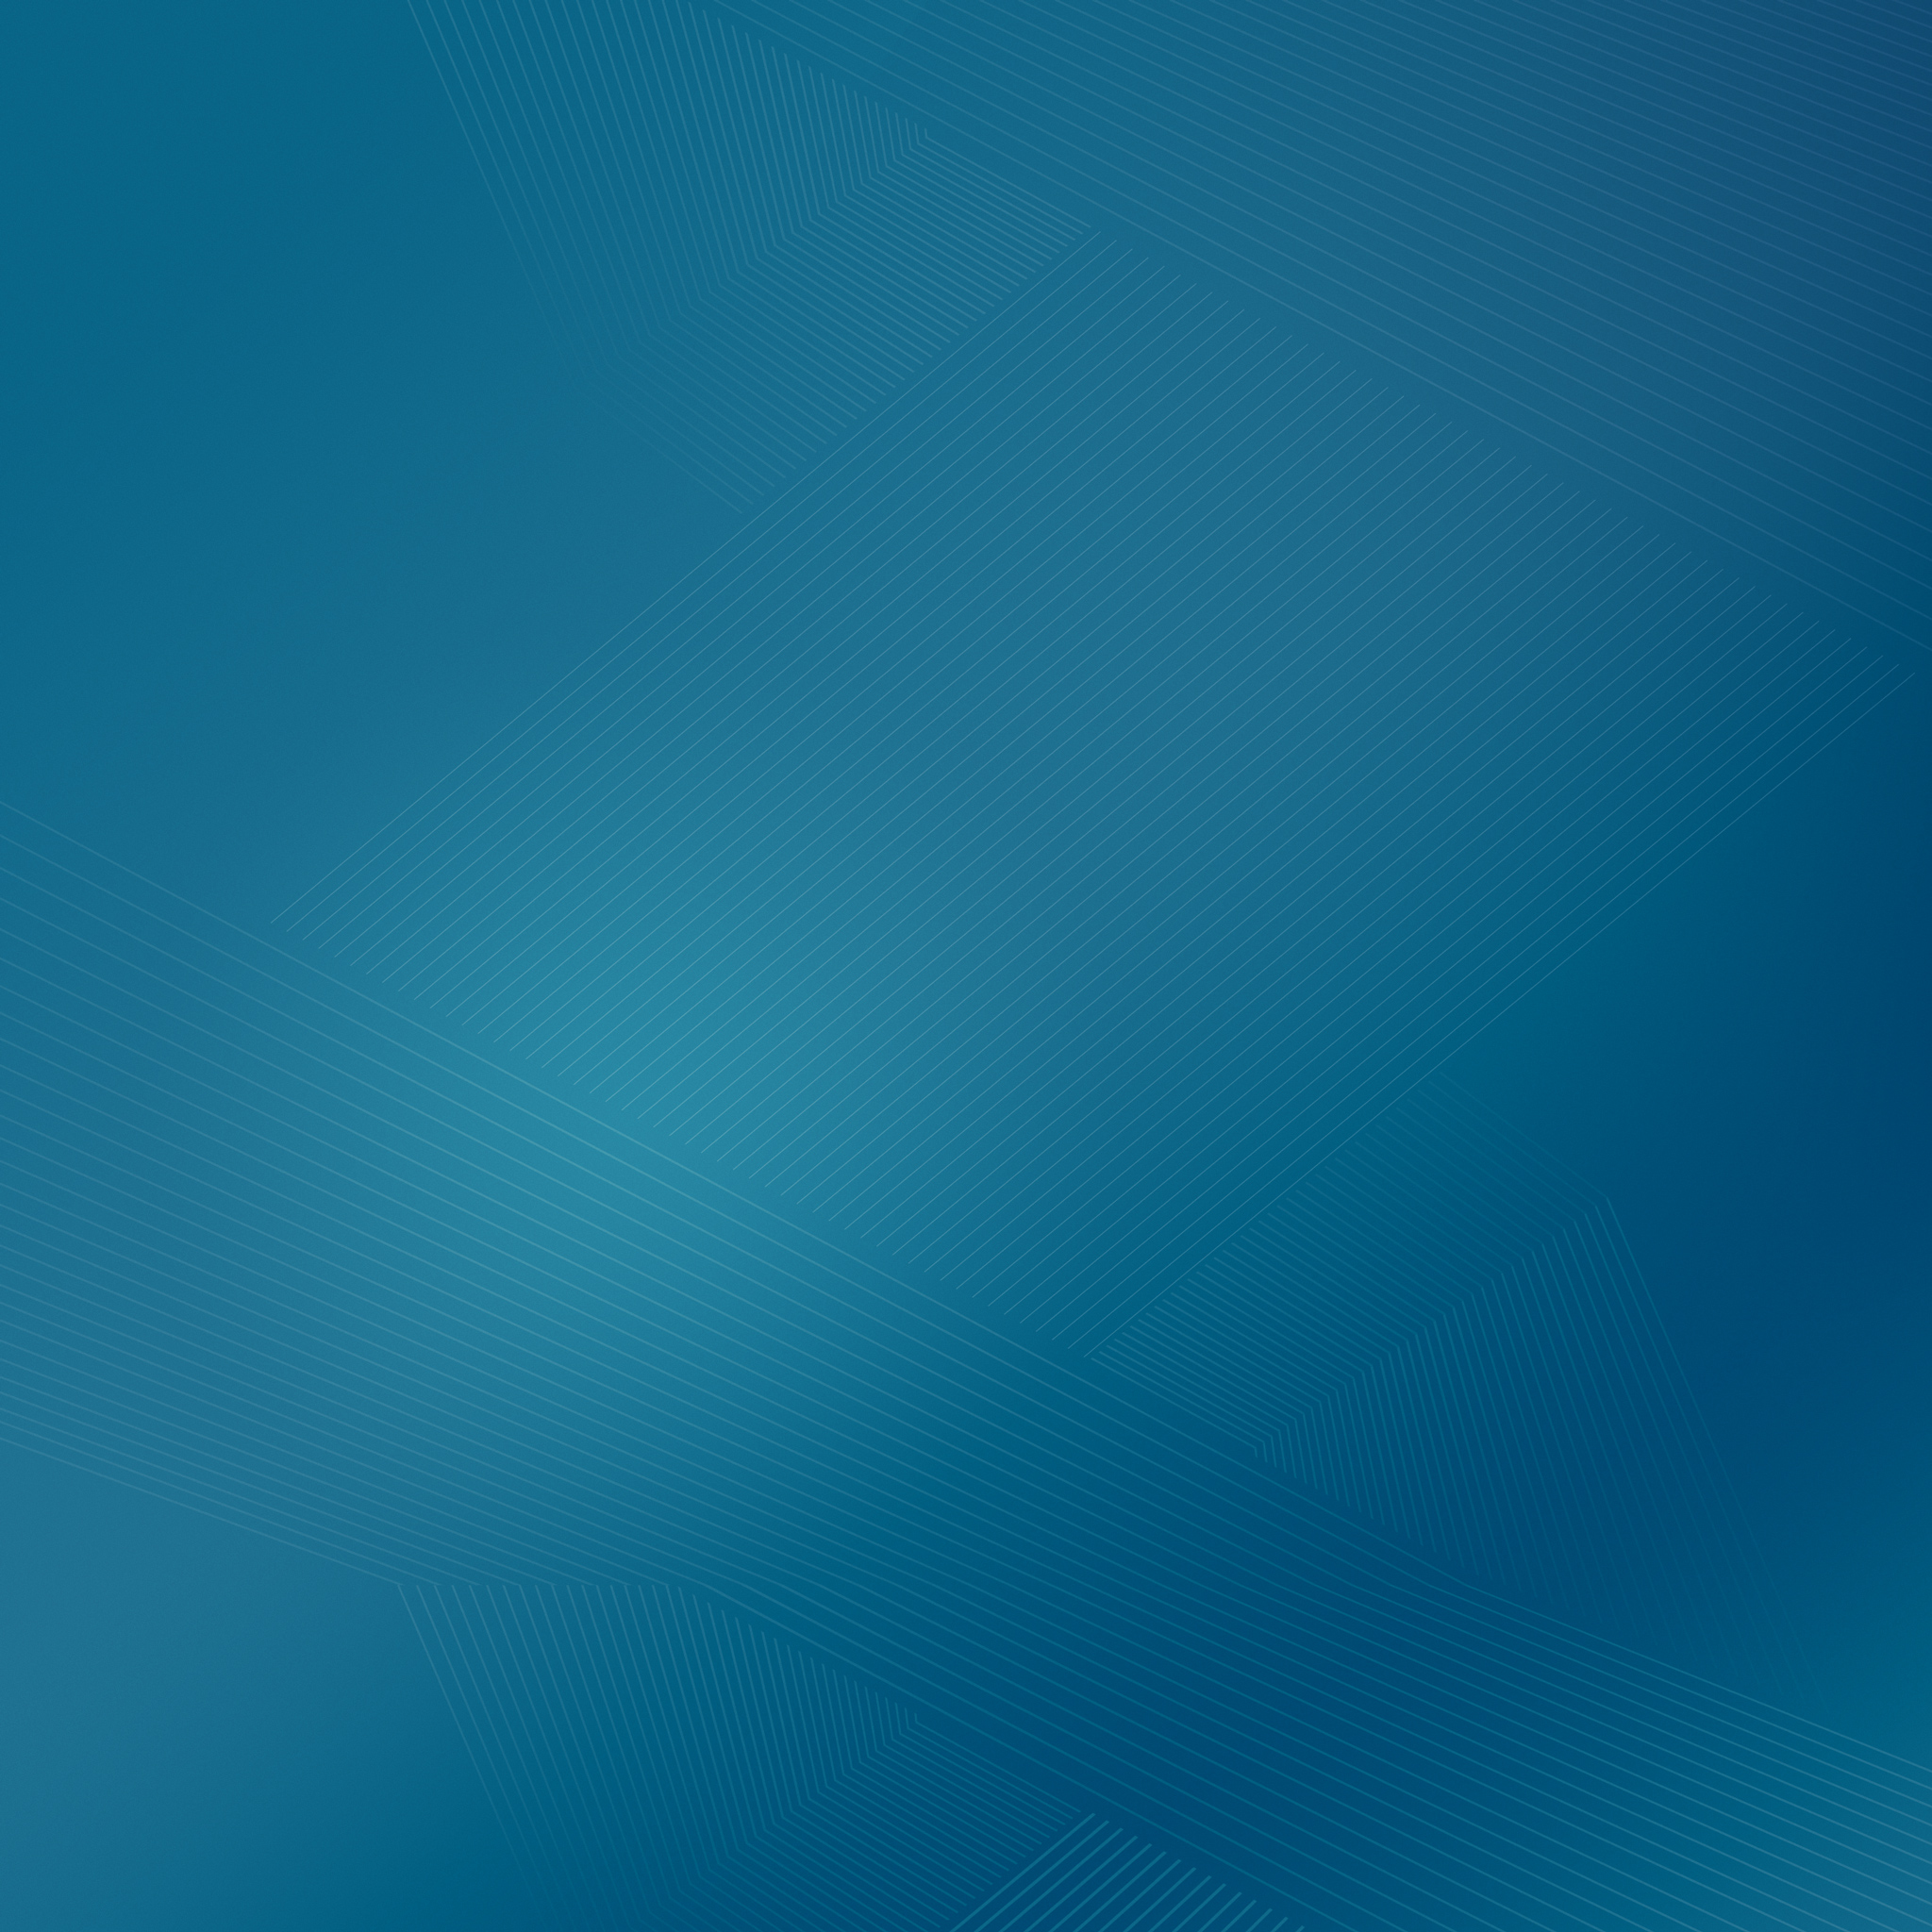 Download Samsung Galaxy Tab S3 Wallpaper Sammobile